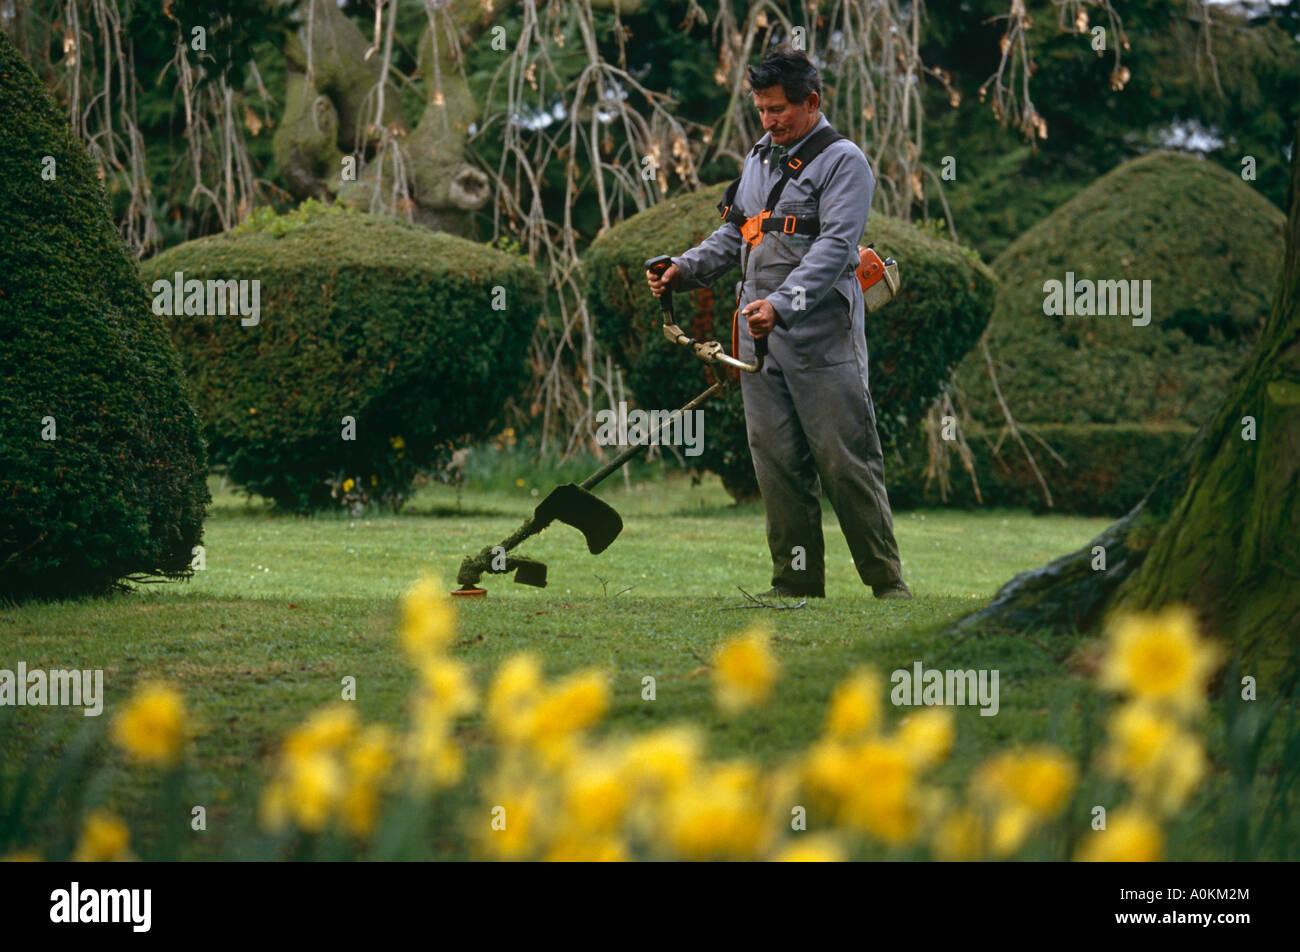 A municipal gardener cuts the lawns in a park in Braintree Essex UK - Stock Image